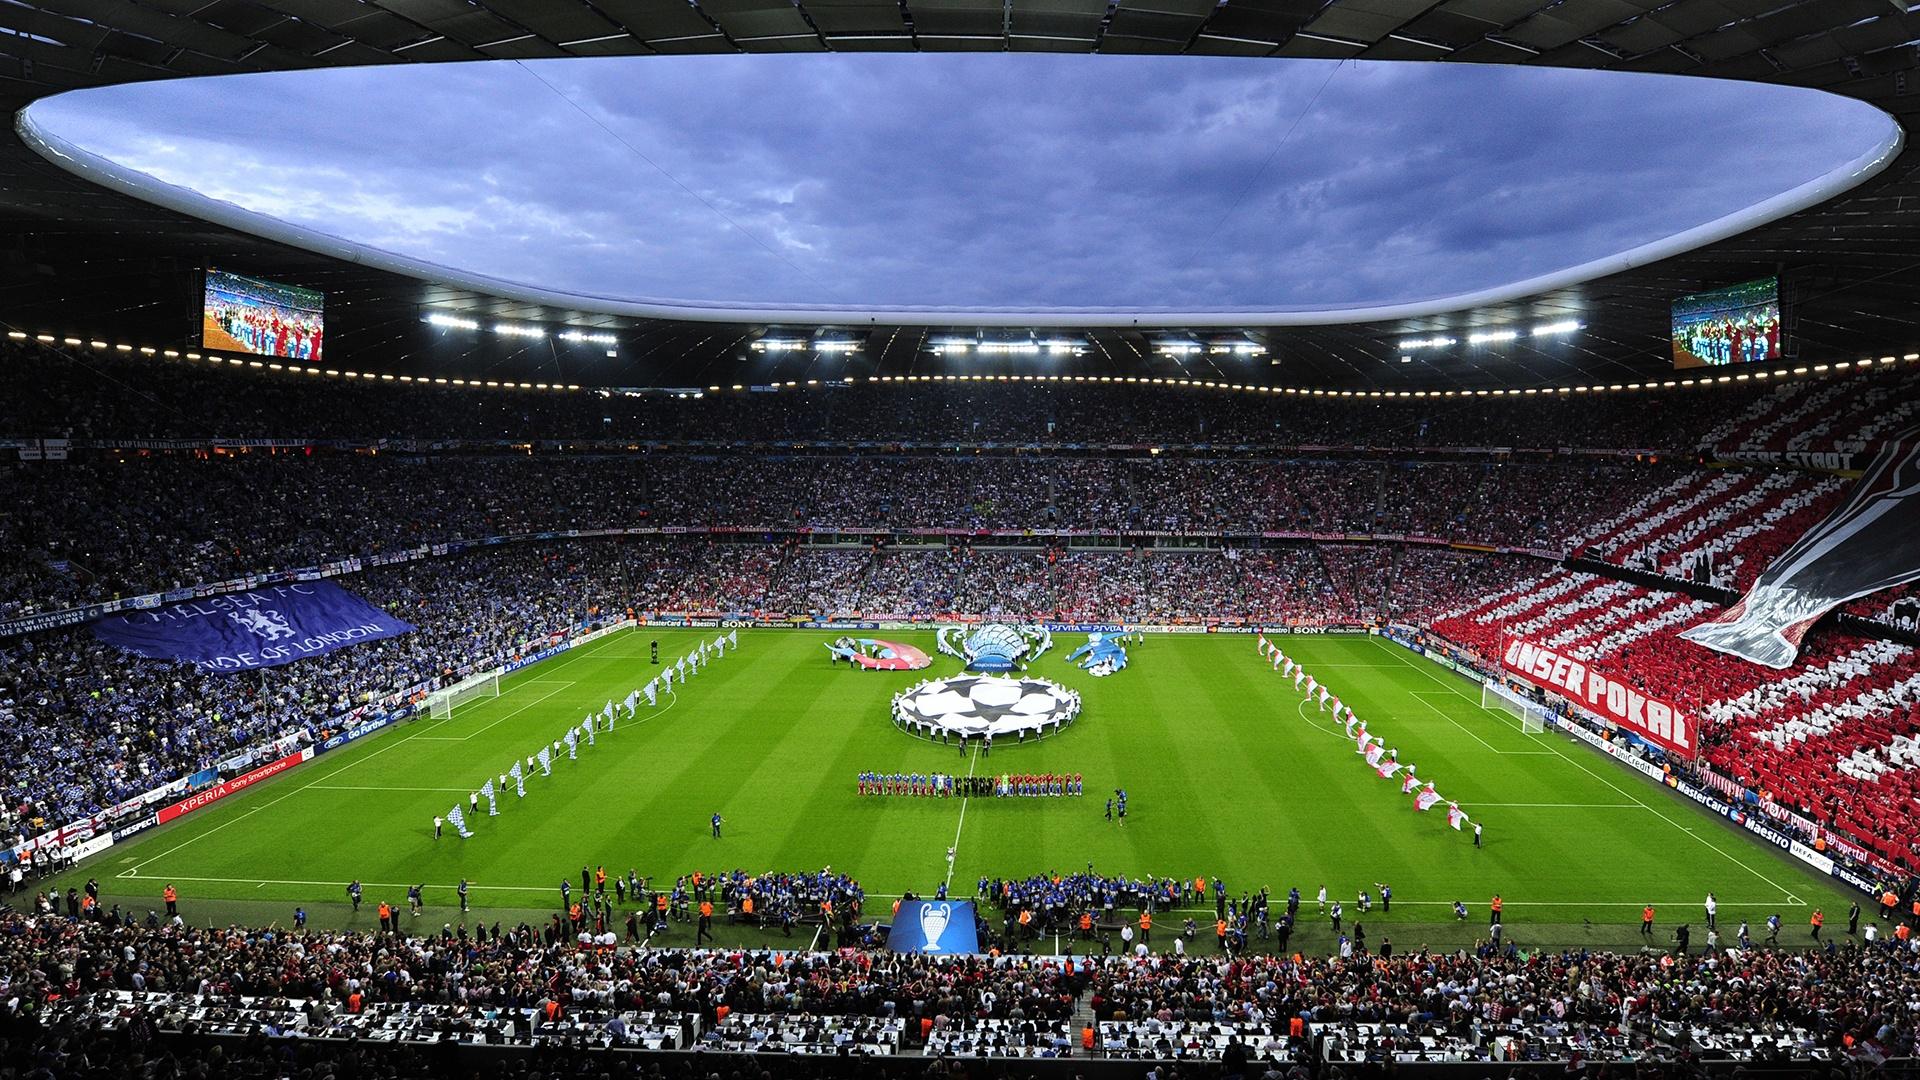 031842-allianz-arena-bayern-munchen-chelsea-fc-football-pitch-stadium-uefa-champions-league